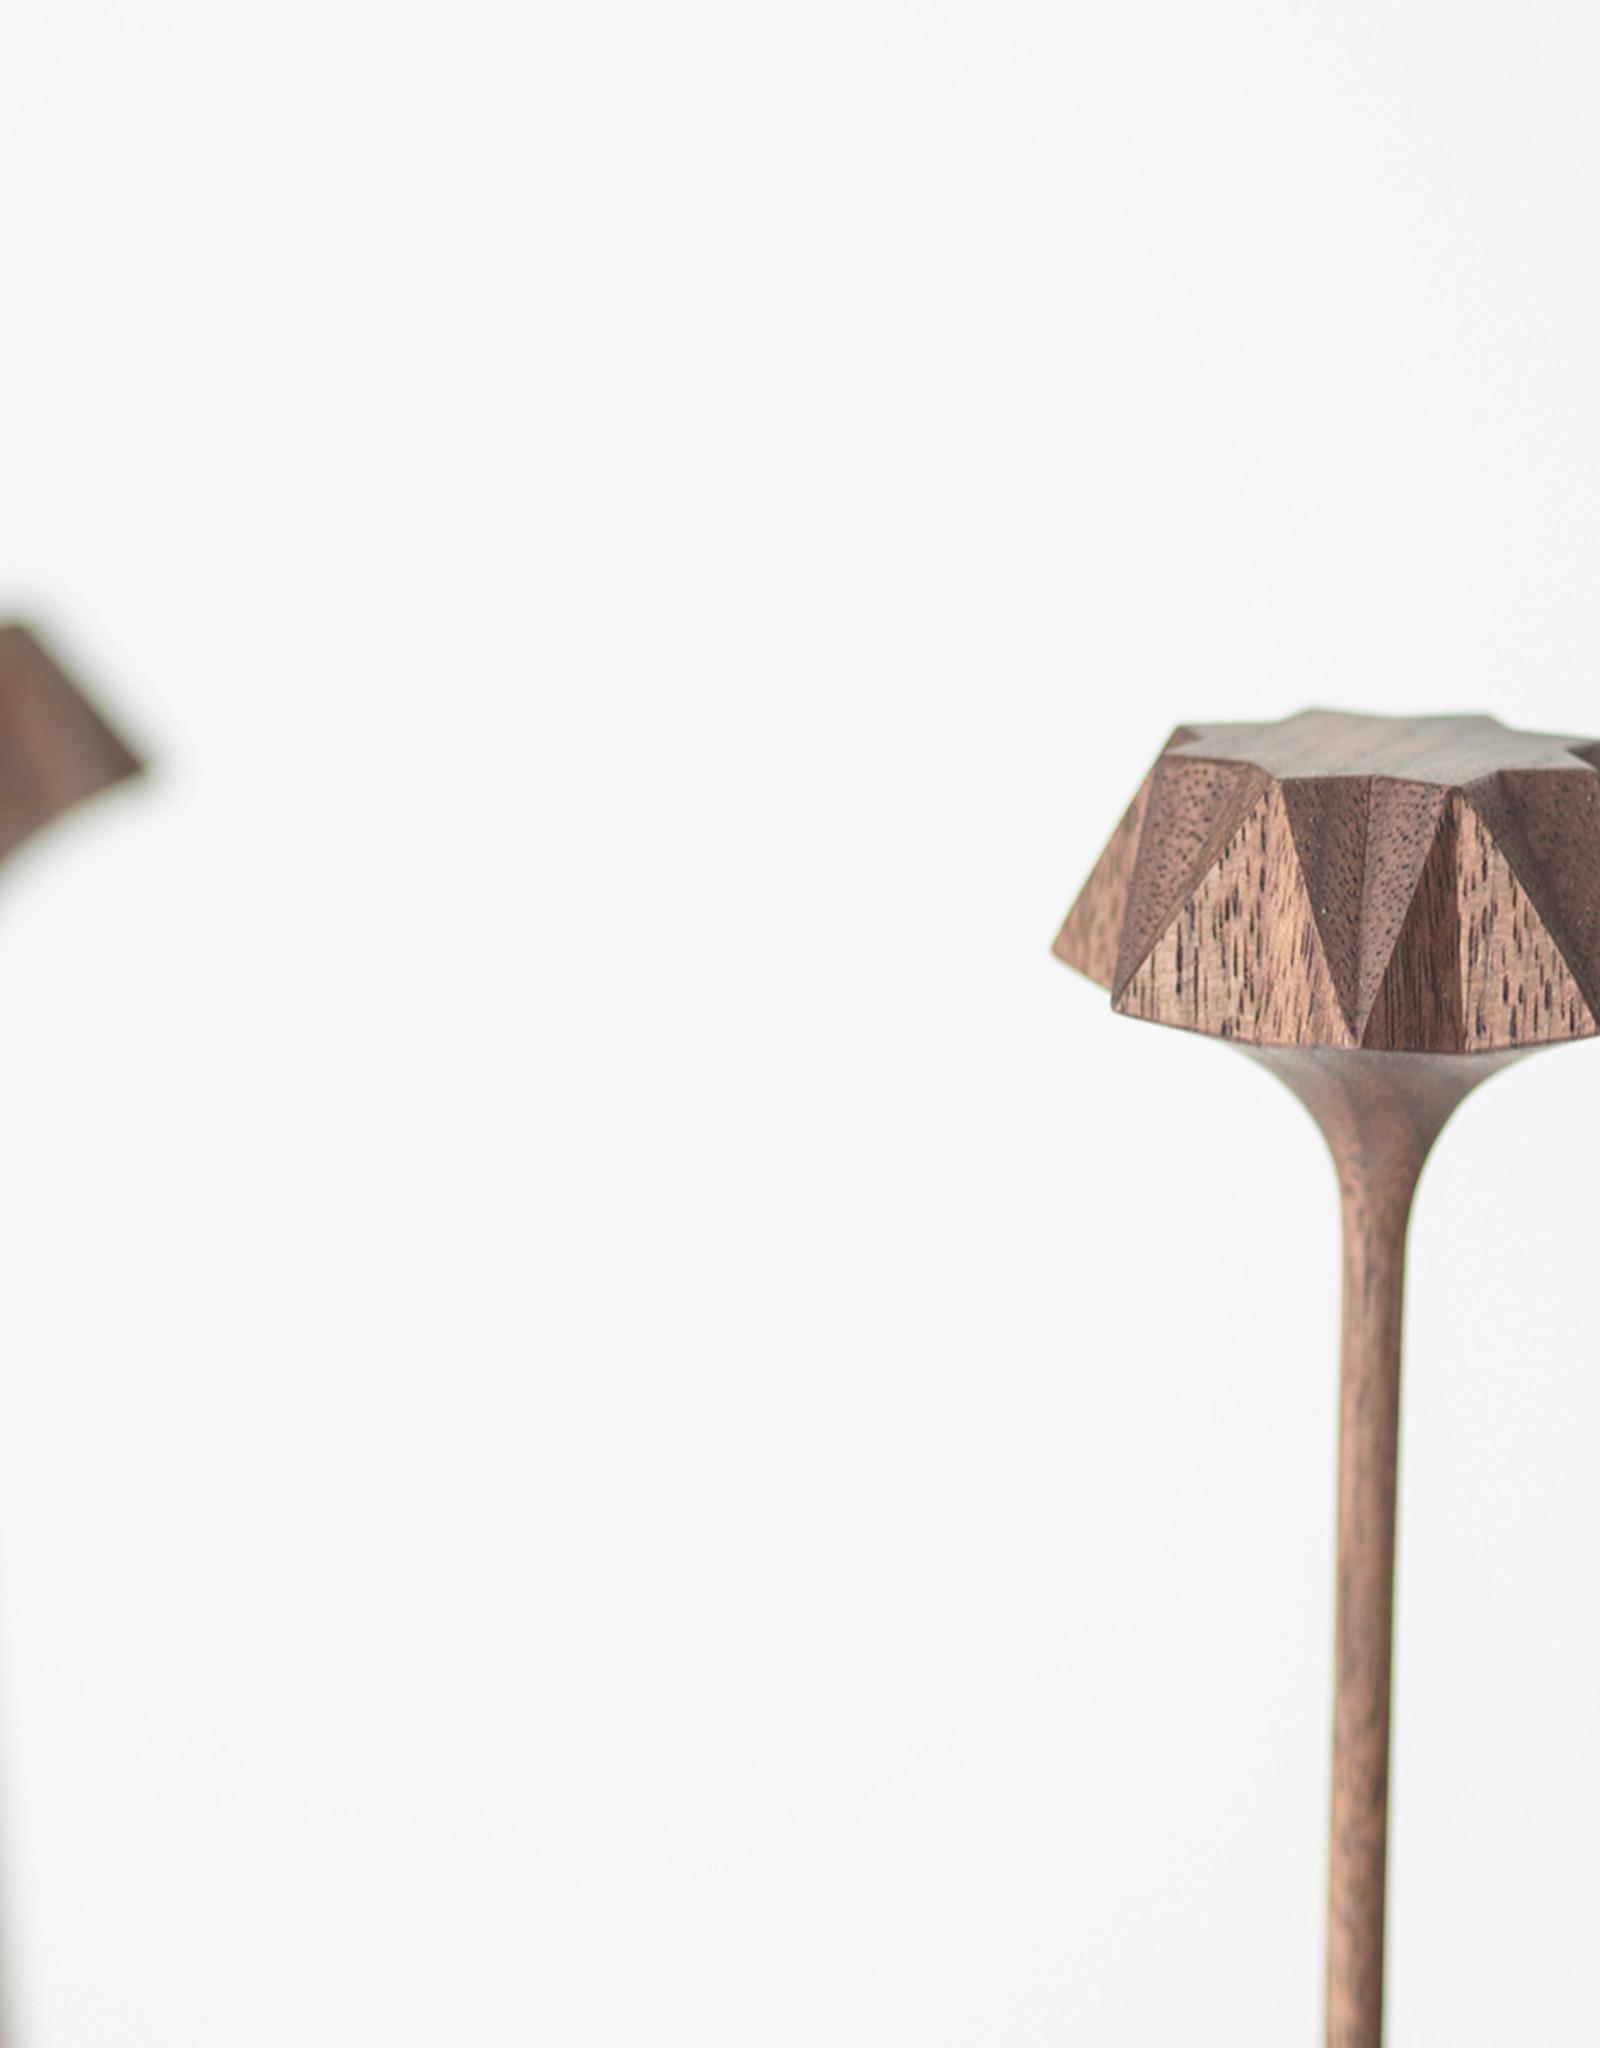 KUKKII sculpture shelf by Antrei Hartikainen